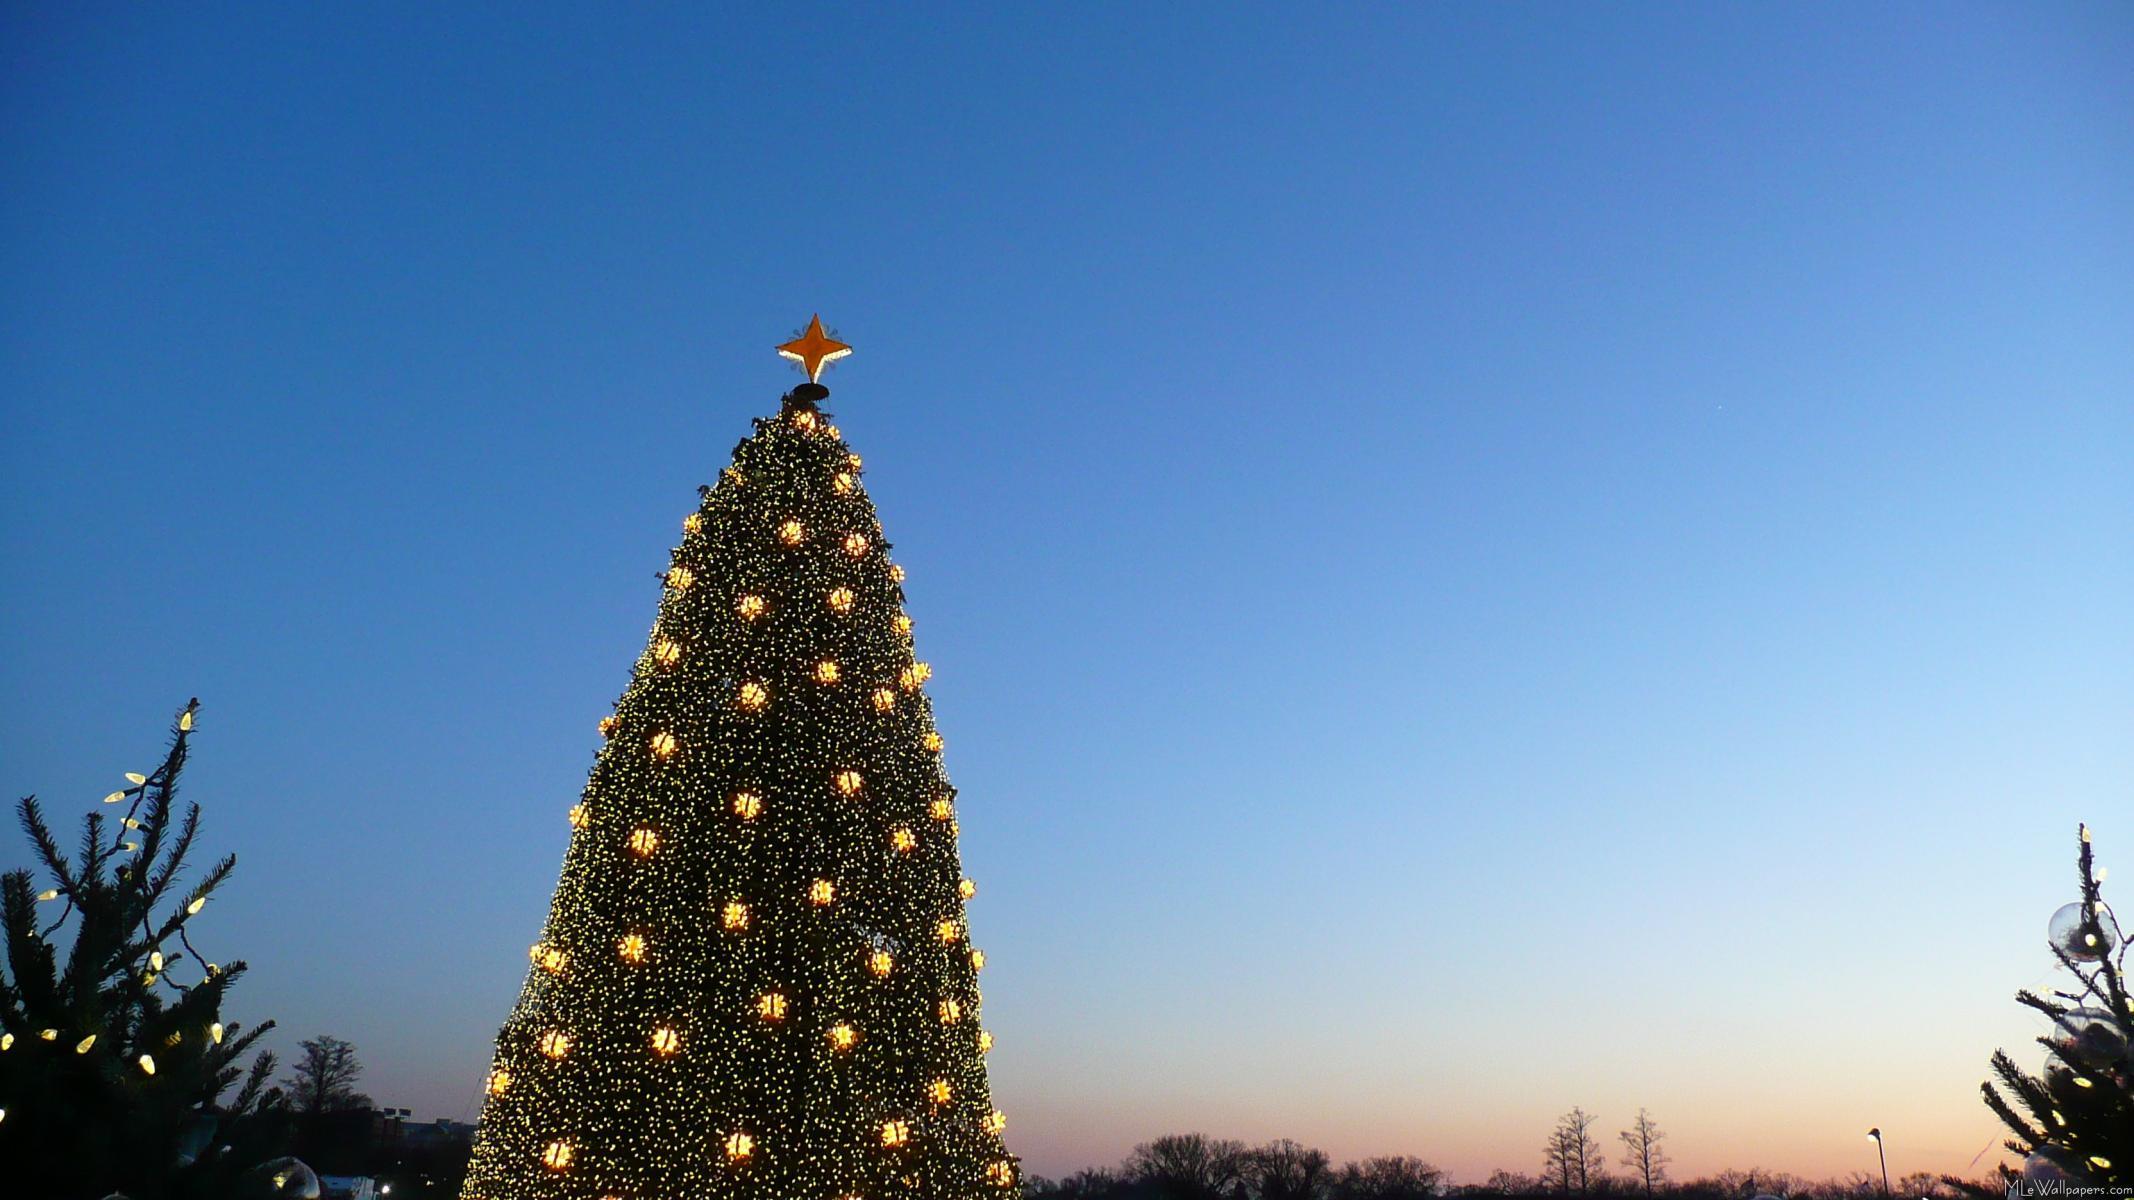 Big And Little Christmas Trees I